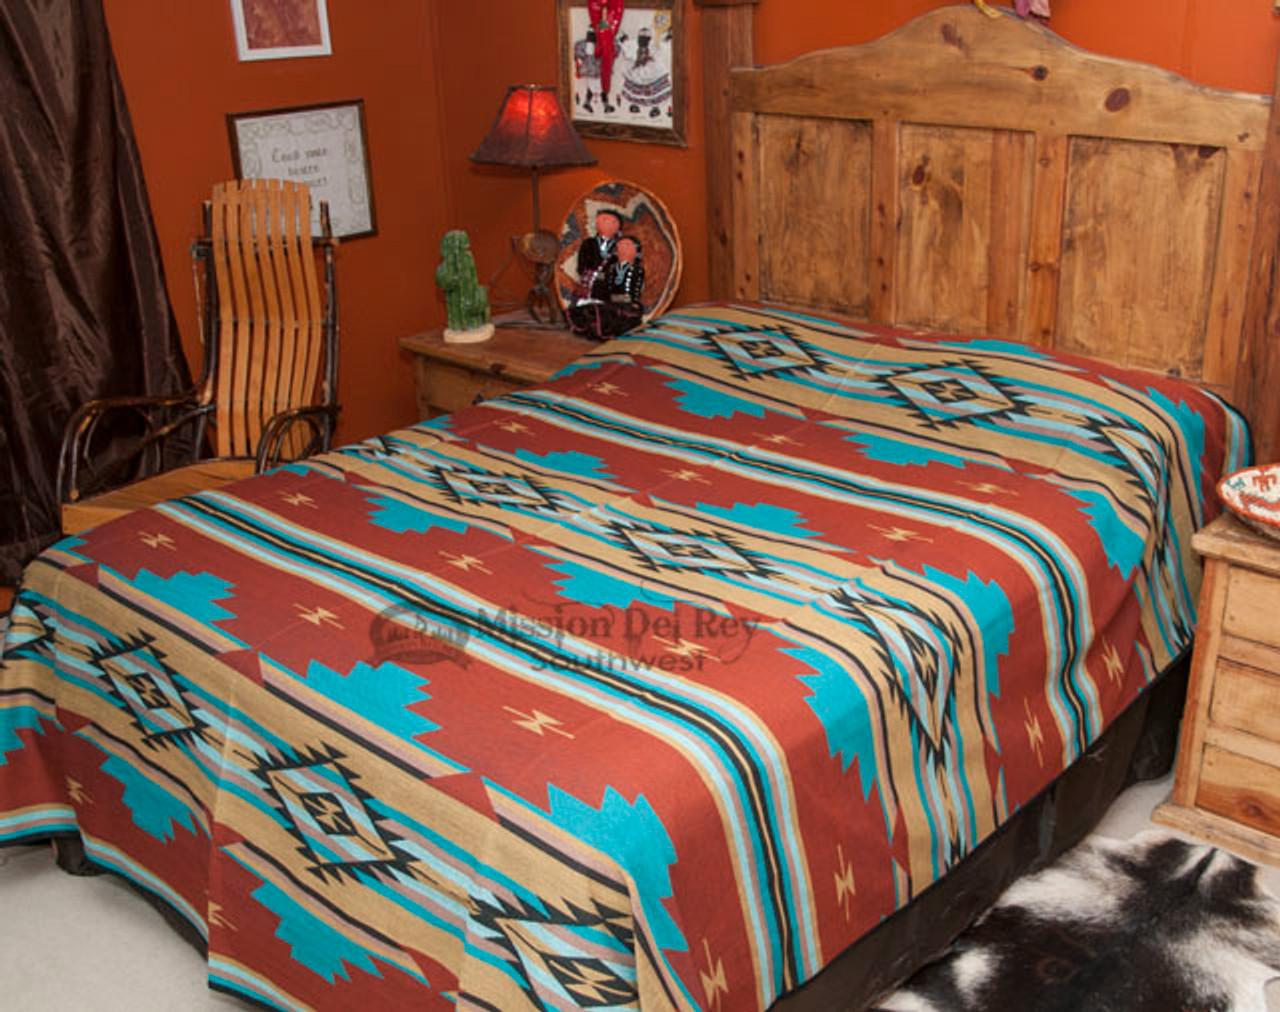 Mission Del Rey Southwest Decor Bedspread Isleta Twin